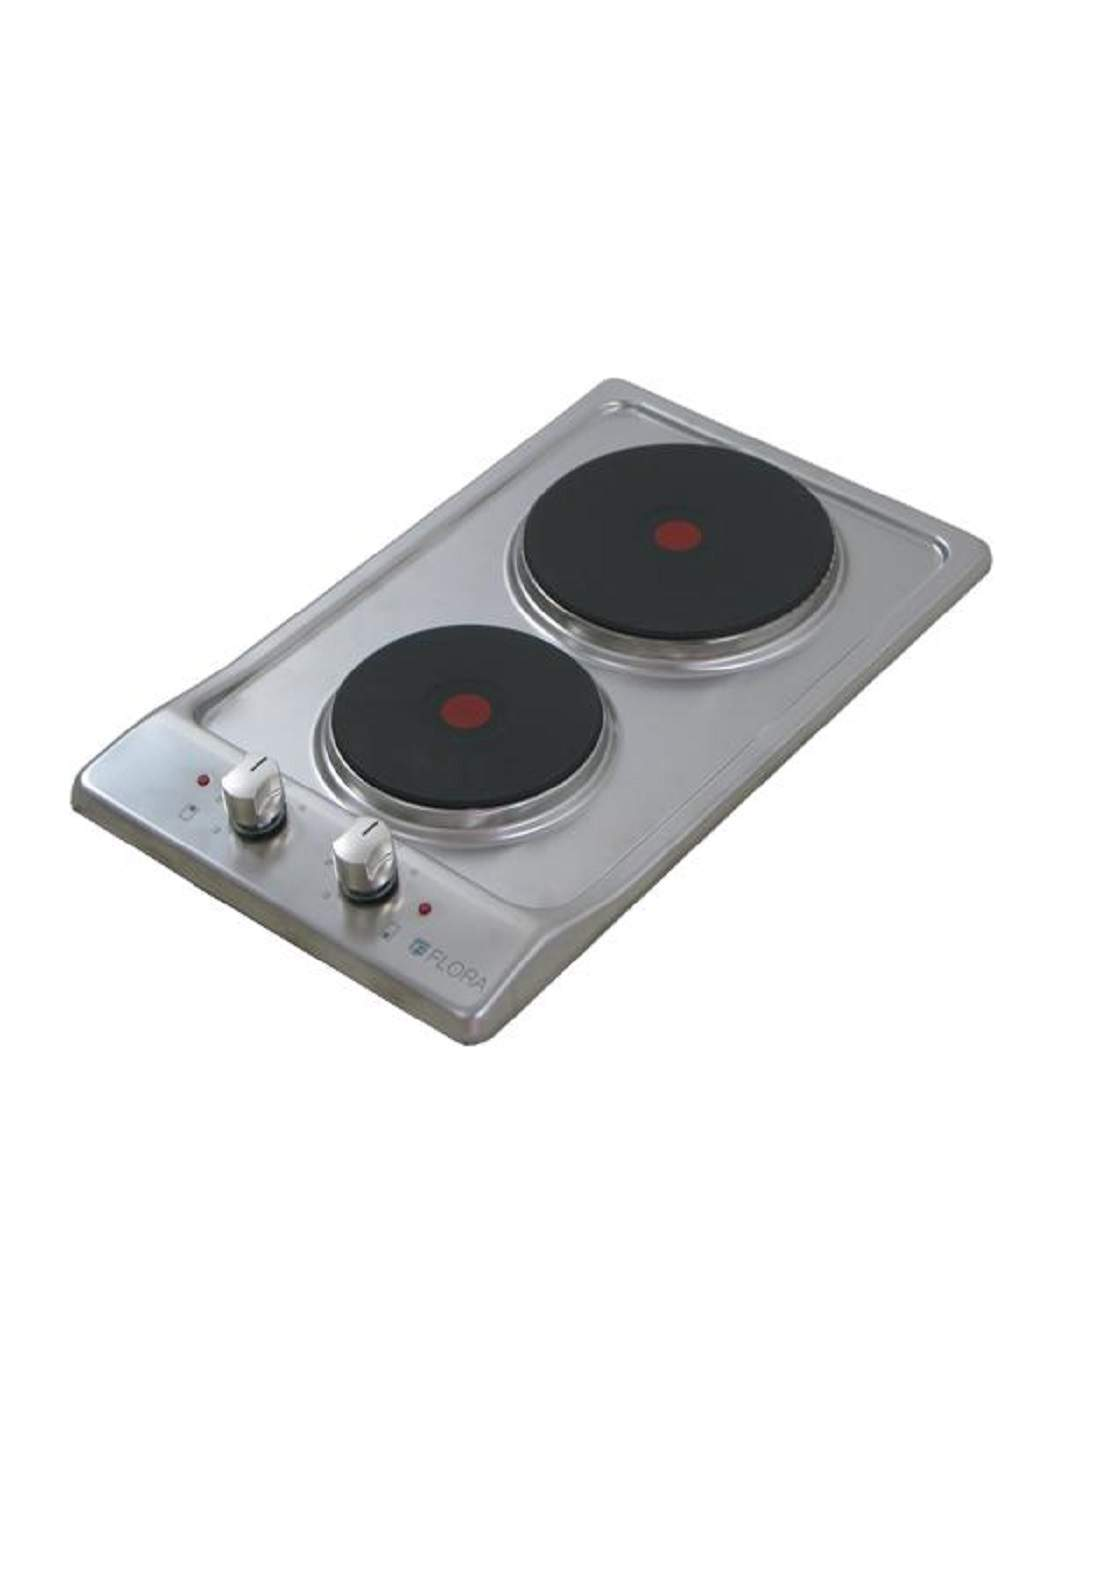 فضي اللون FLORA FLBH10-EP-L32X هيتر كهربائي منضدي من